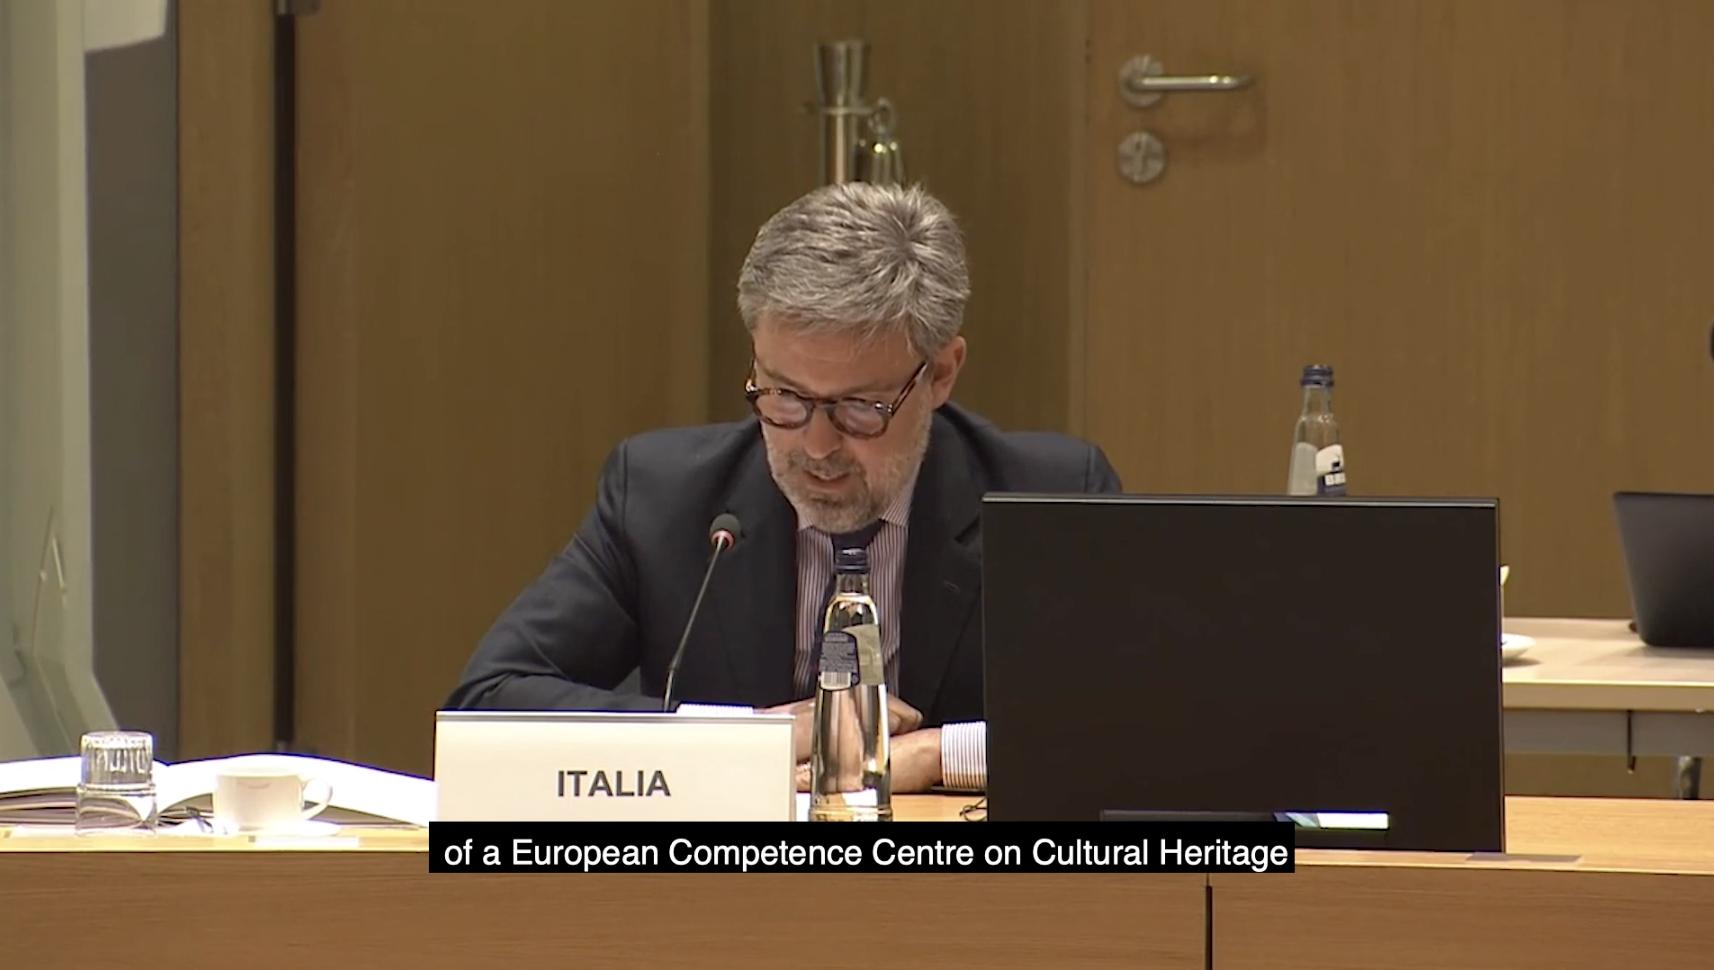 Screen shot from EU Council of Culture 18-05-21